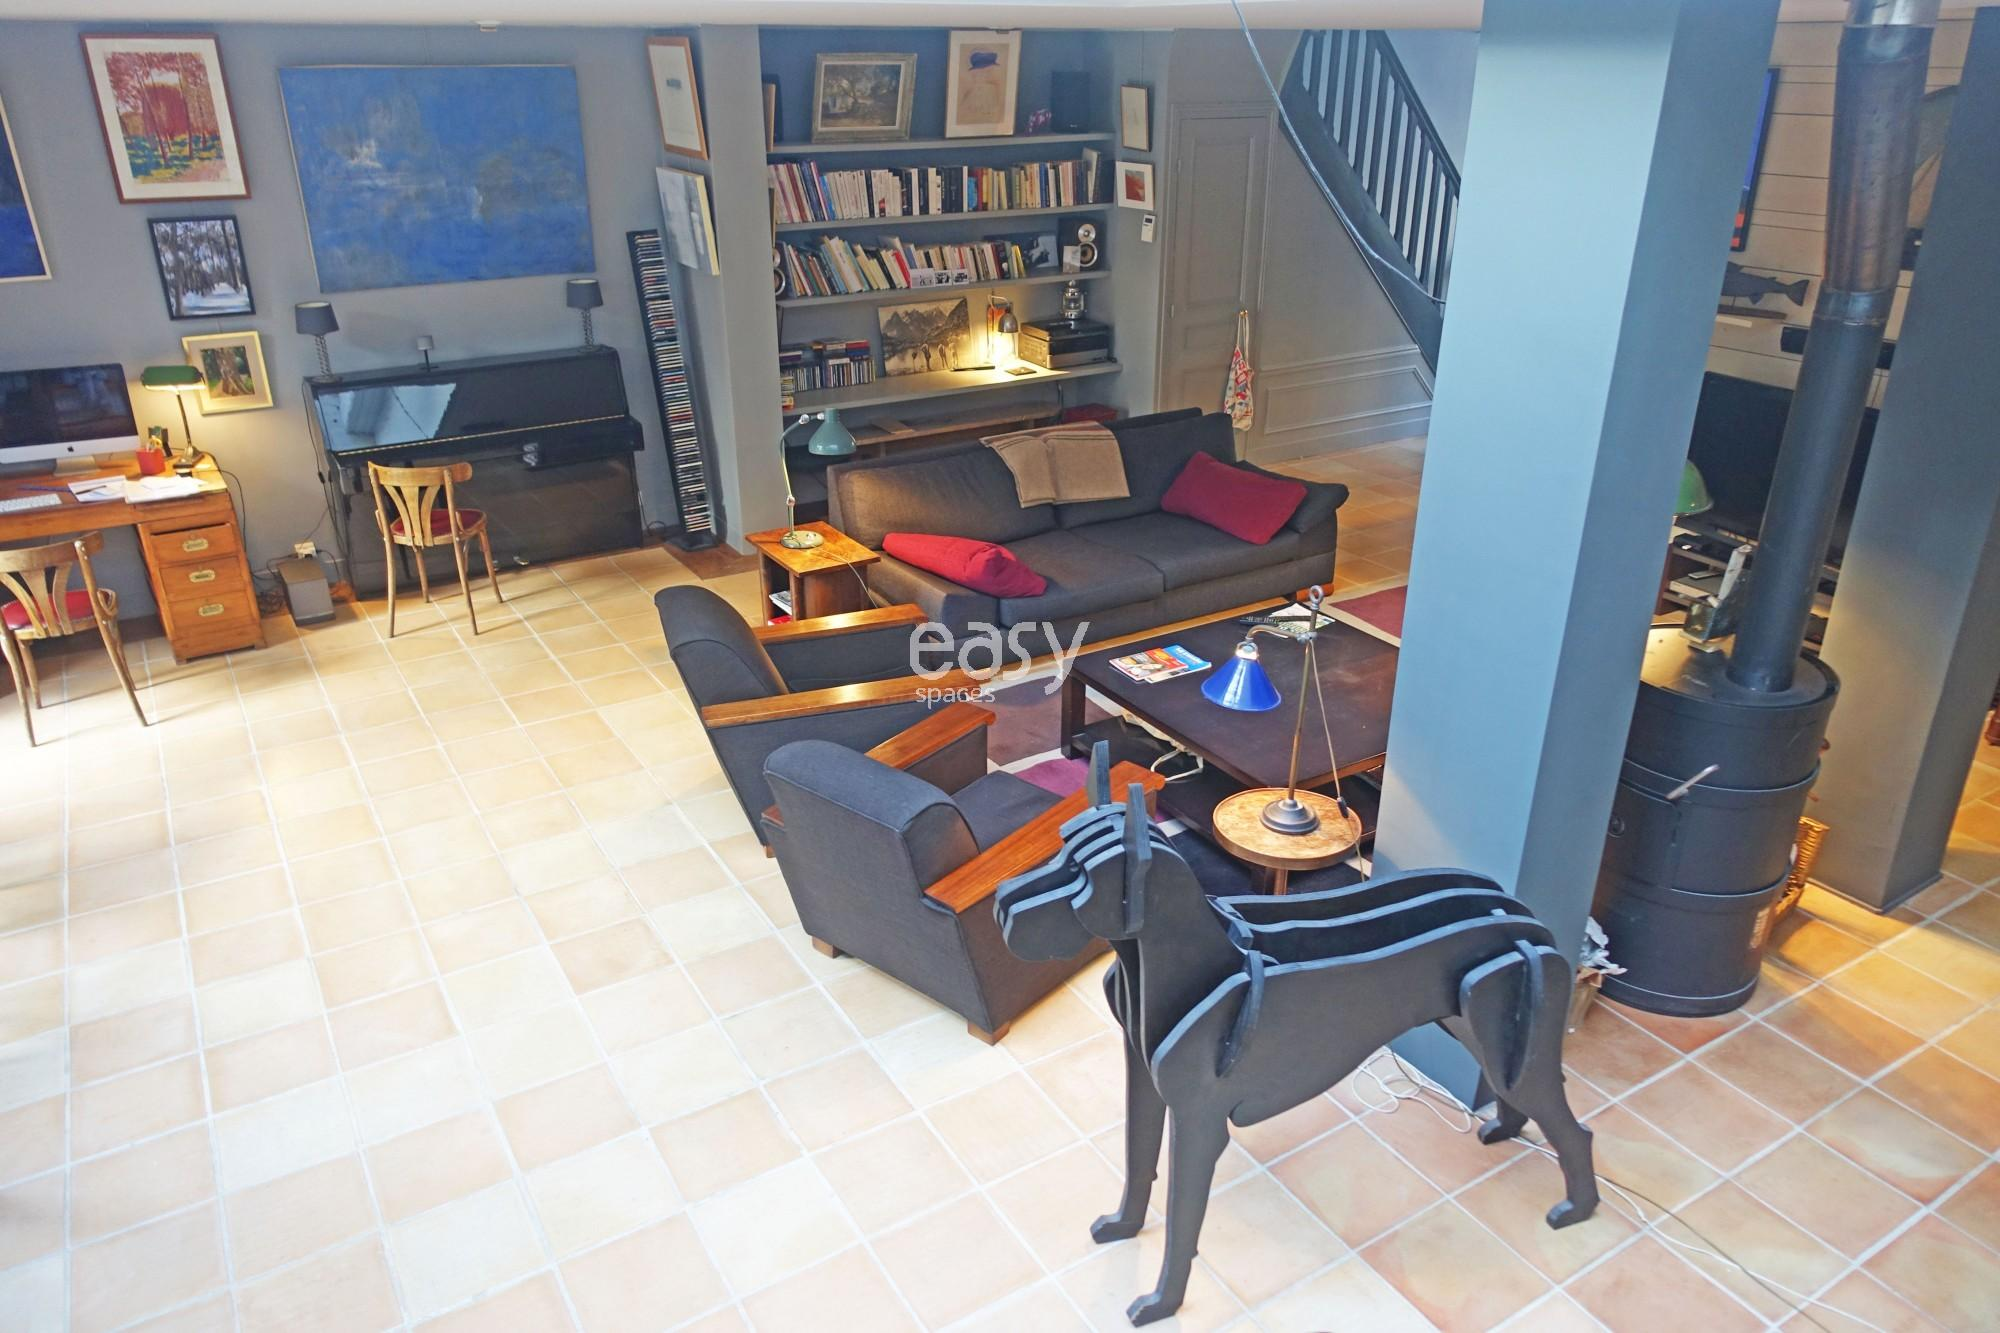 Maison proche paris elegant maison moderne atypique for Garage gentilly villejuif